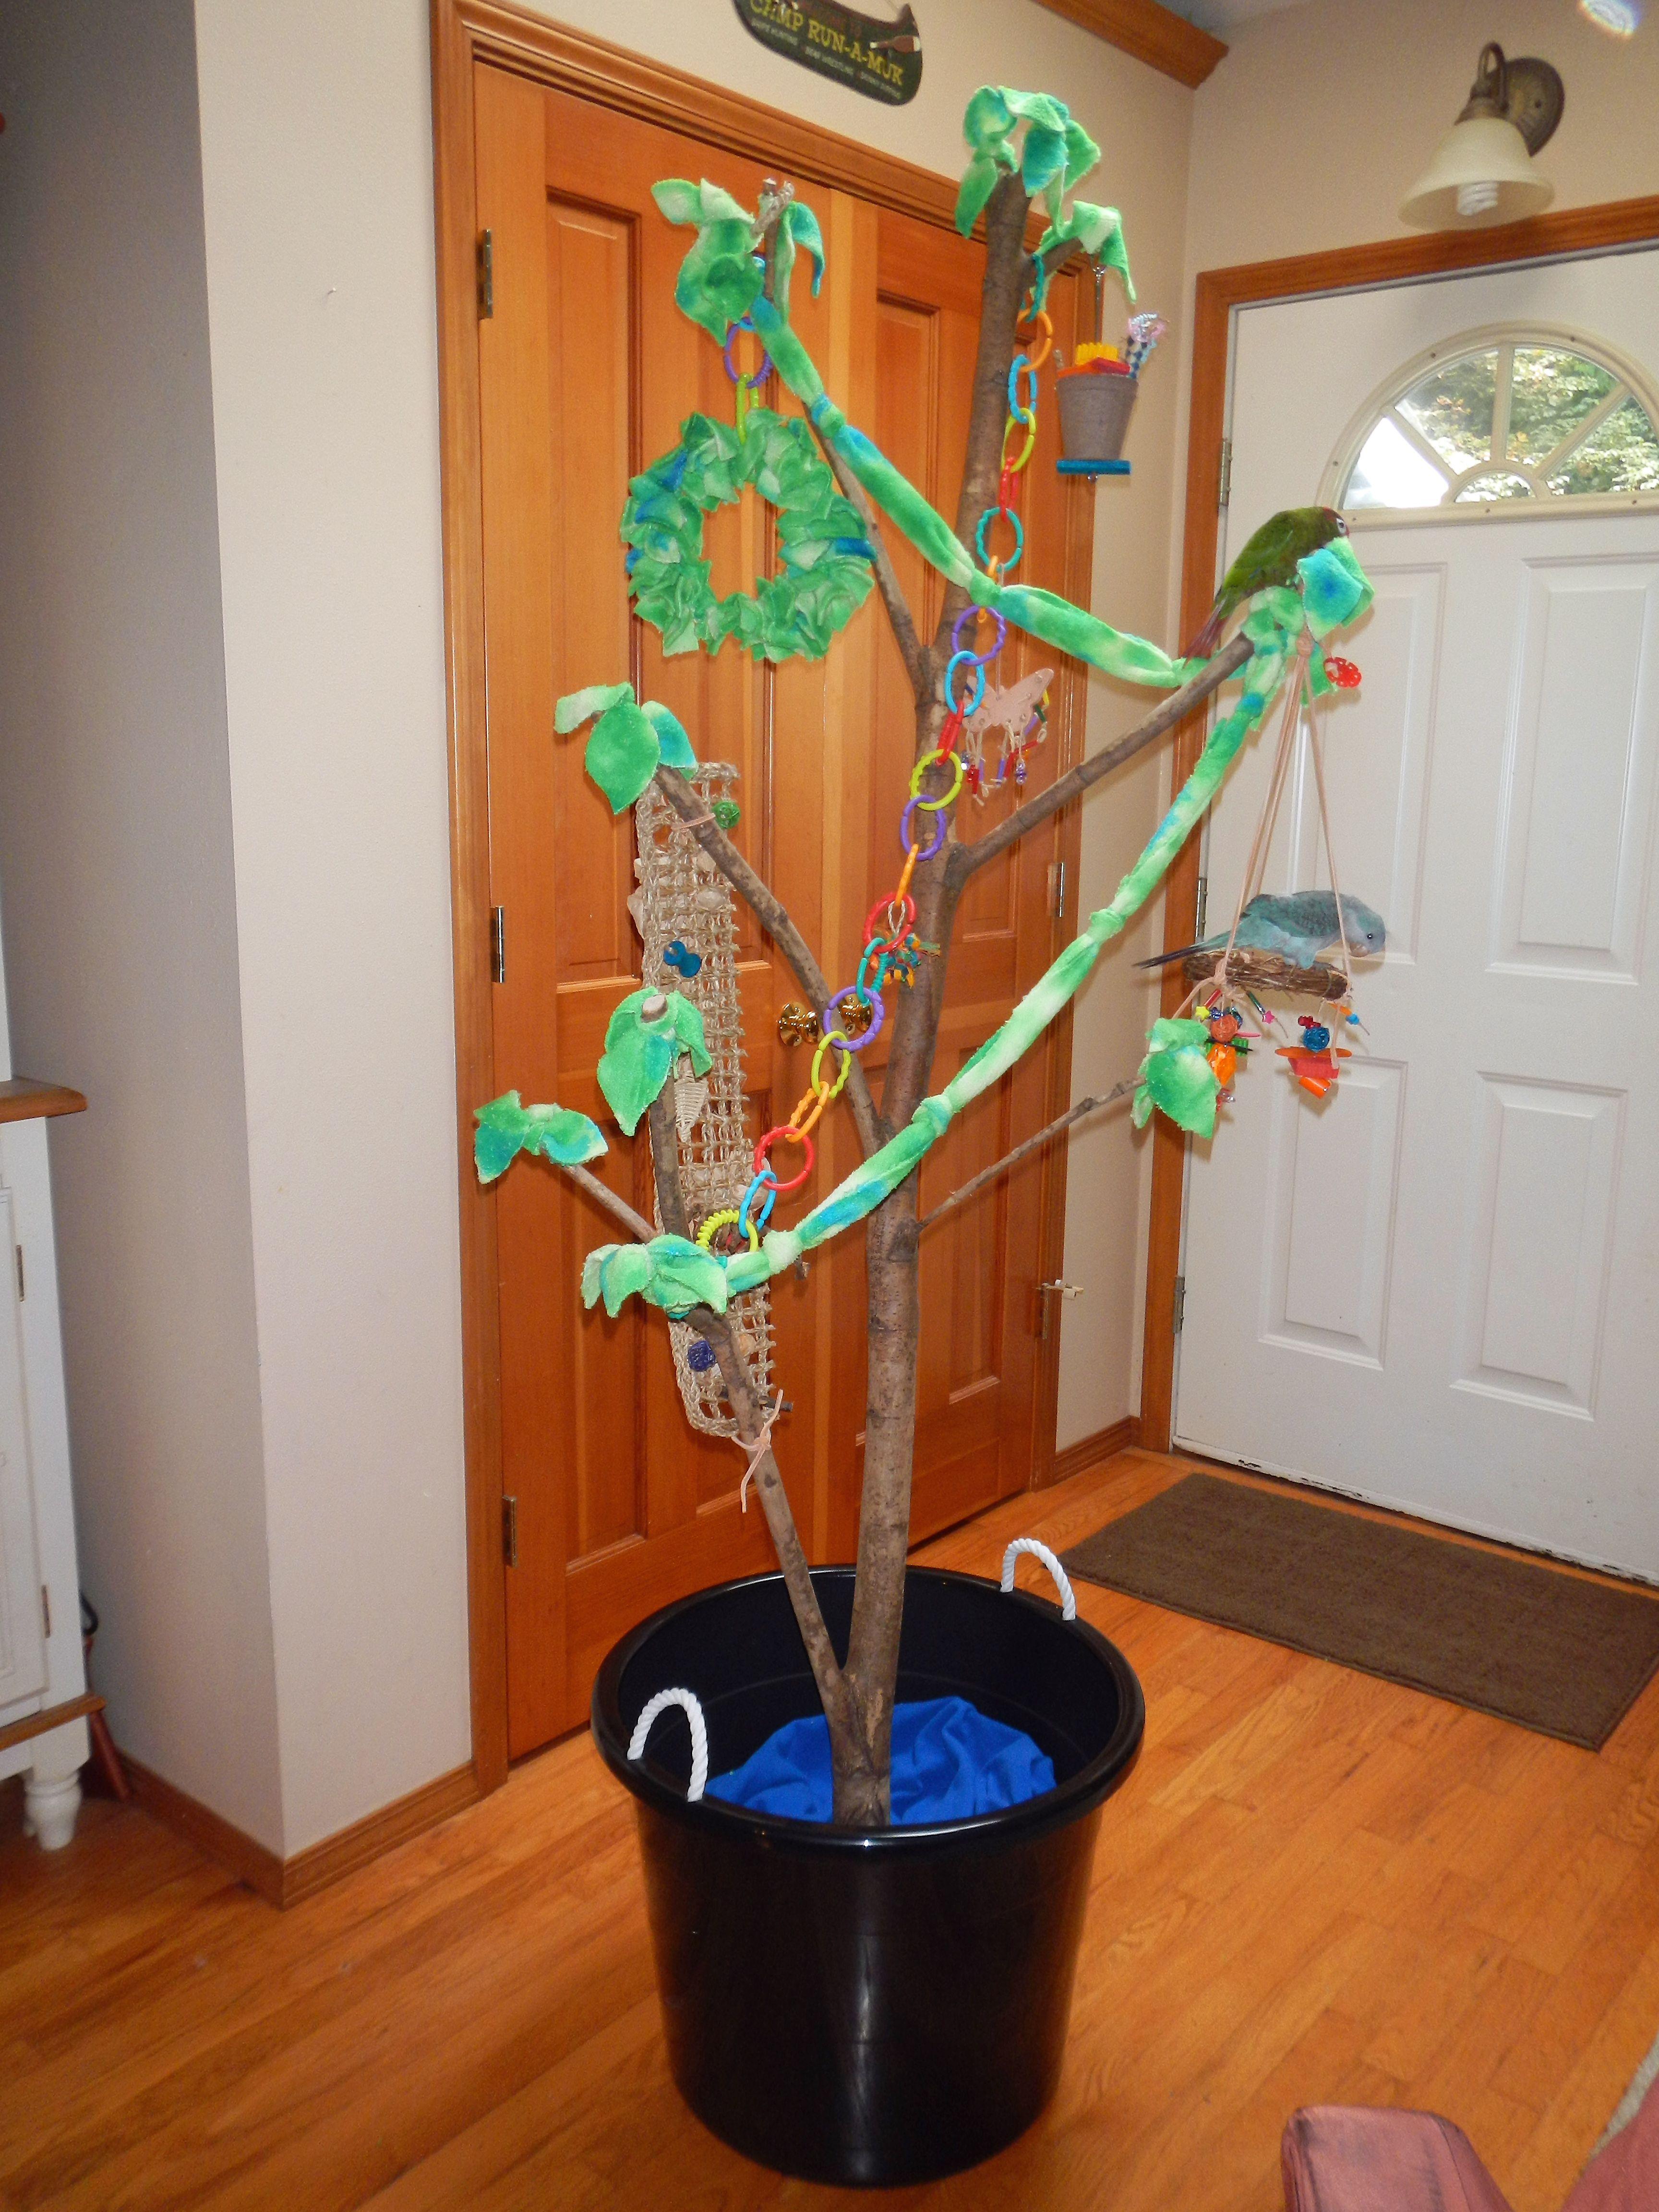 diy parrot play forage tree great for stimulating. Black Bedroom Furniture Sets. Home Design Ideas